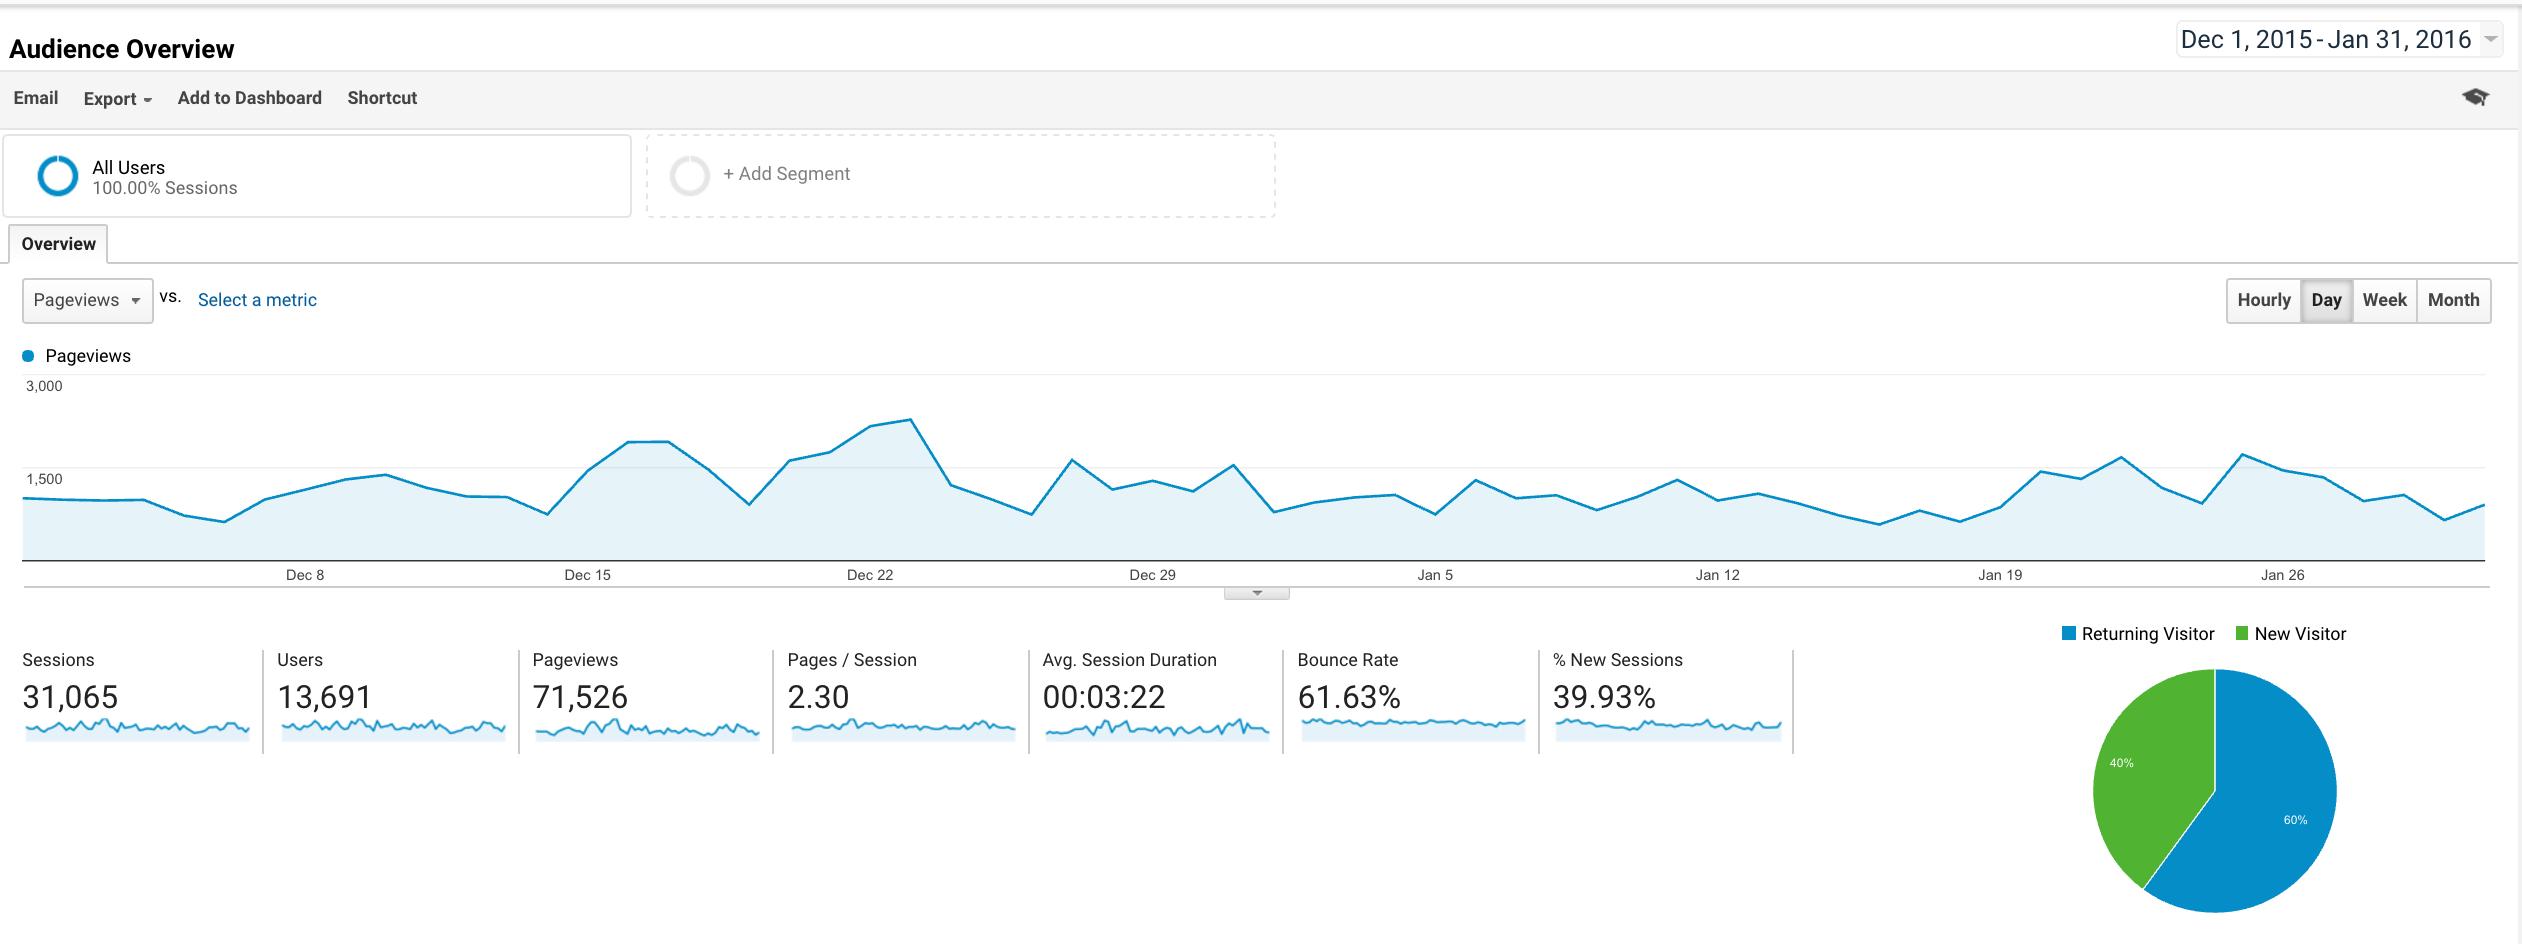 Google Analytics for end of 2015 Giving Season